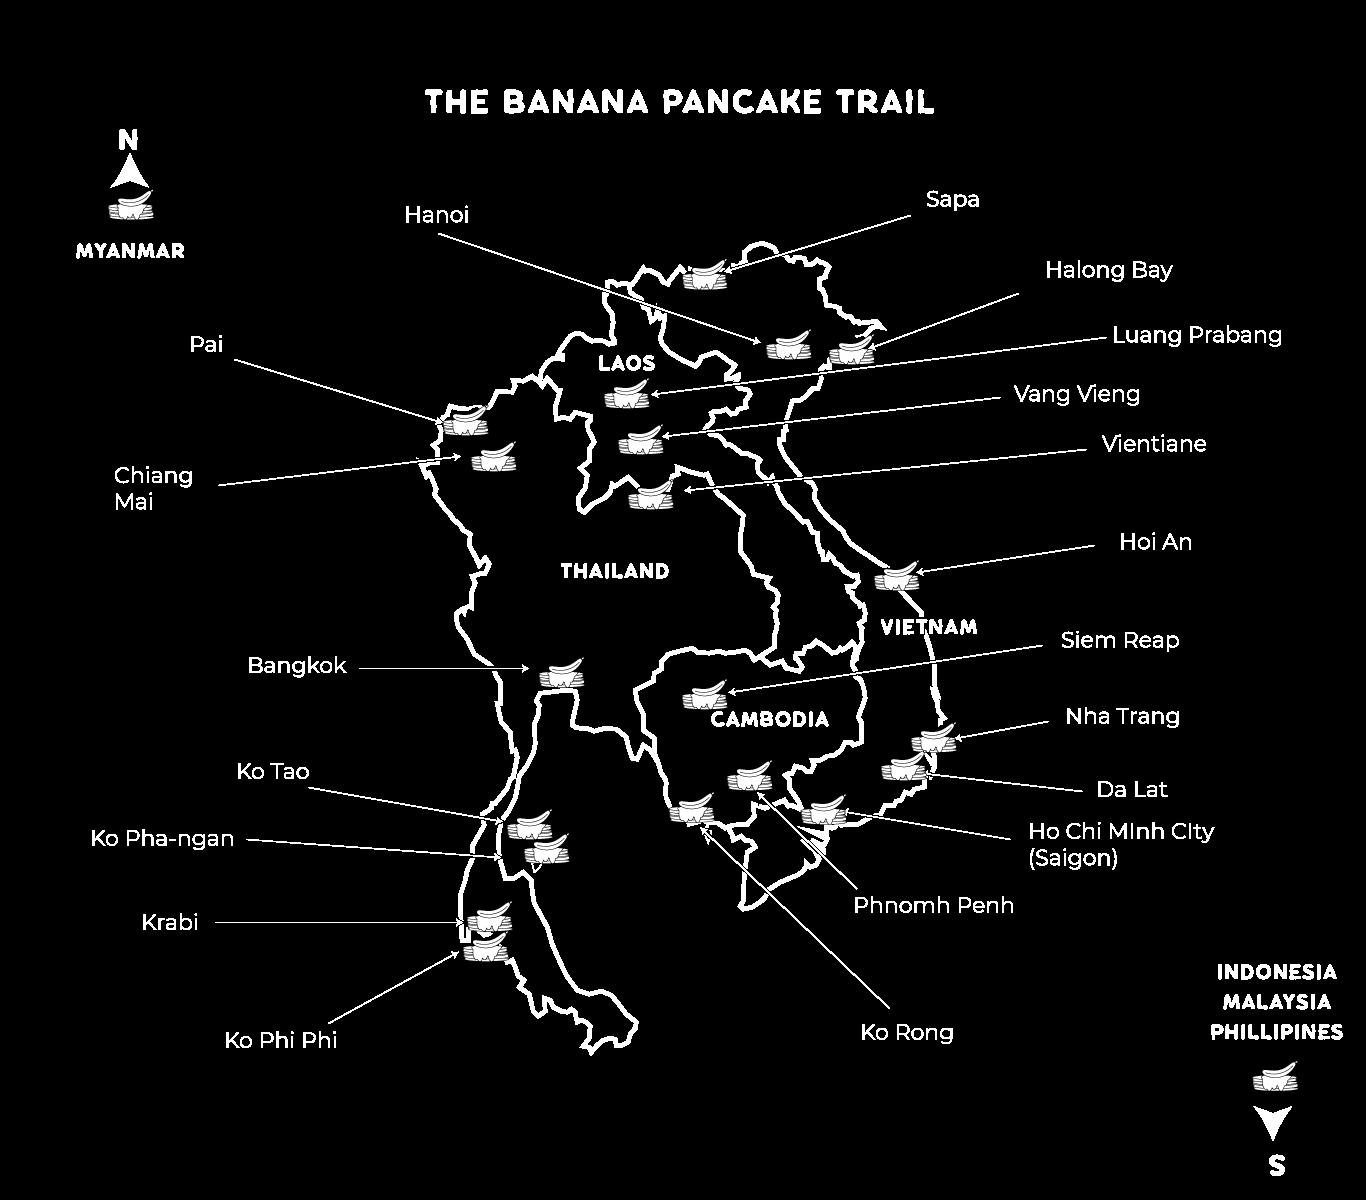 banana pancake trail map